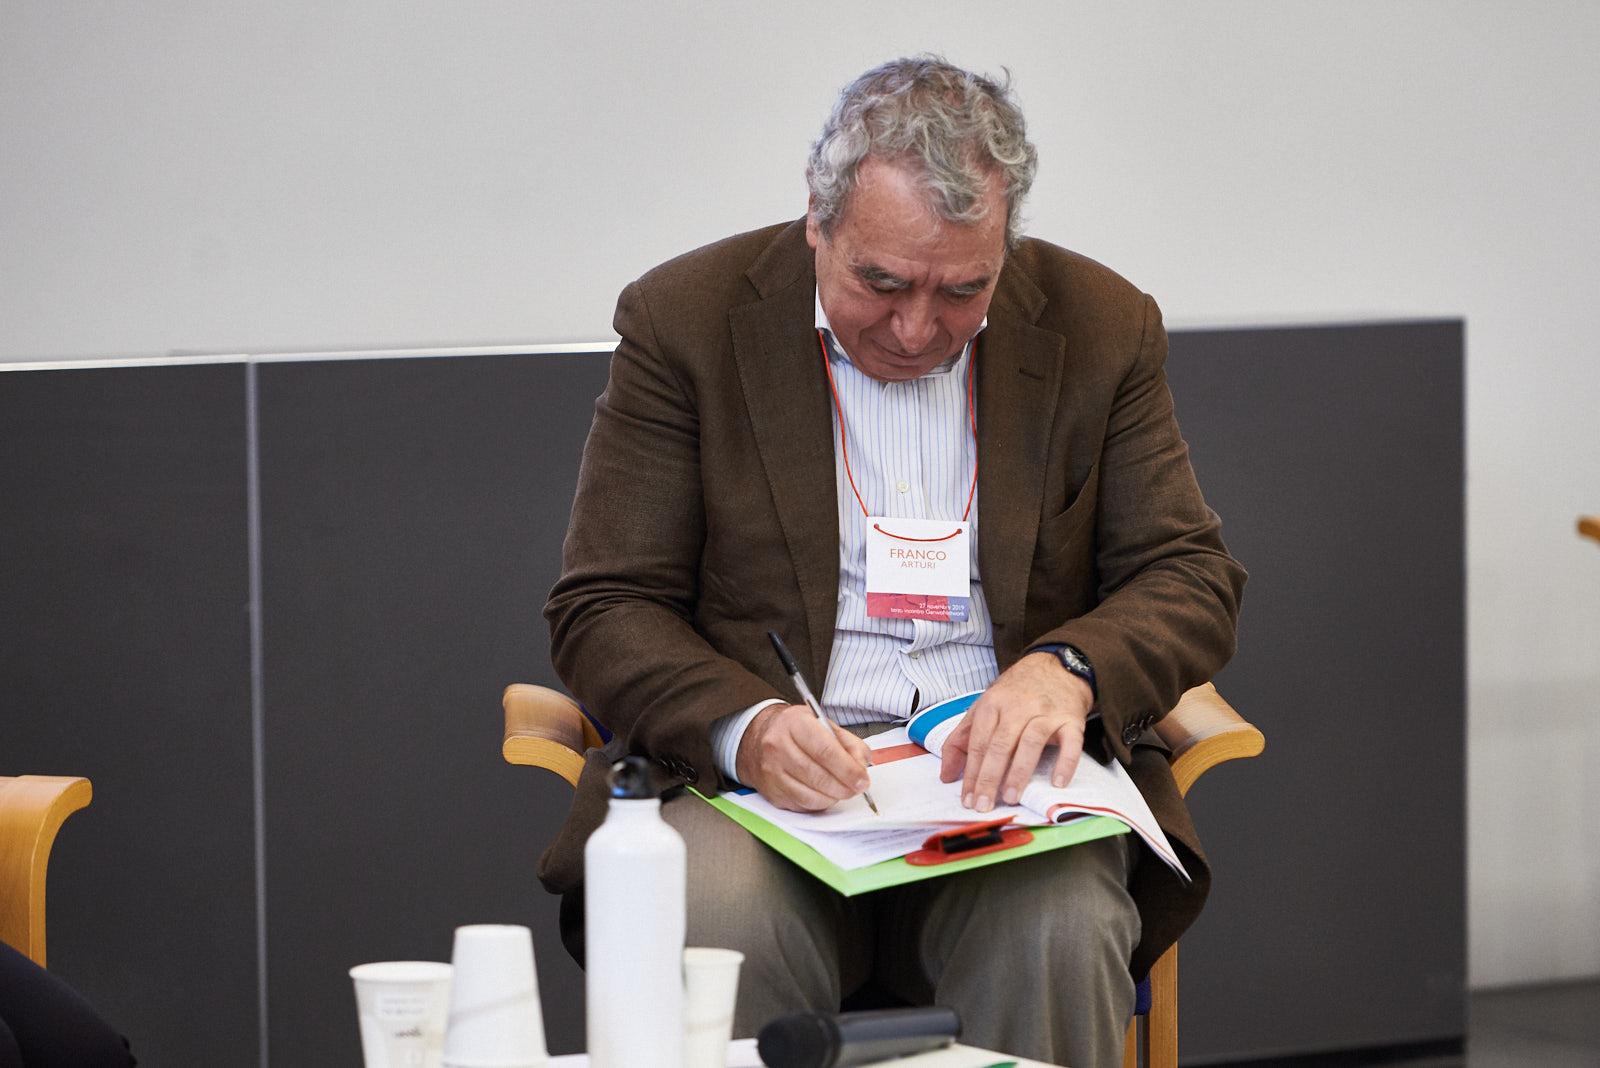 Franco Arturi signs the Charter